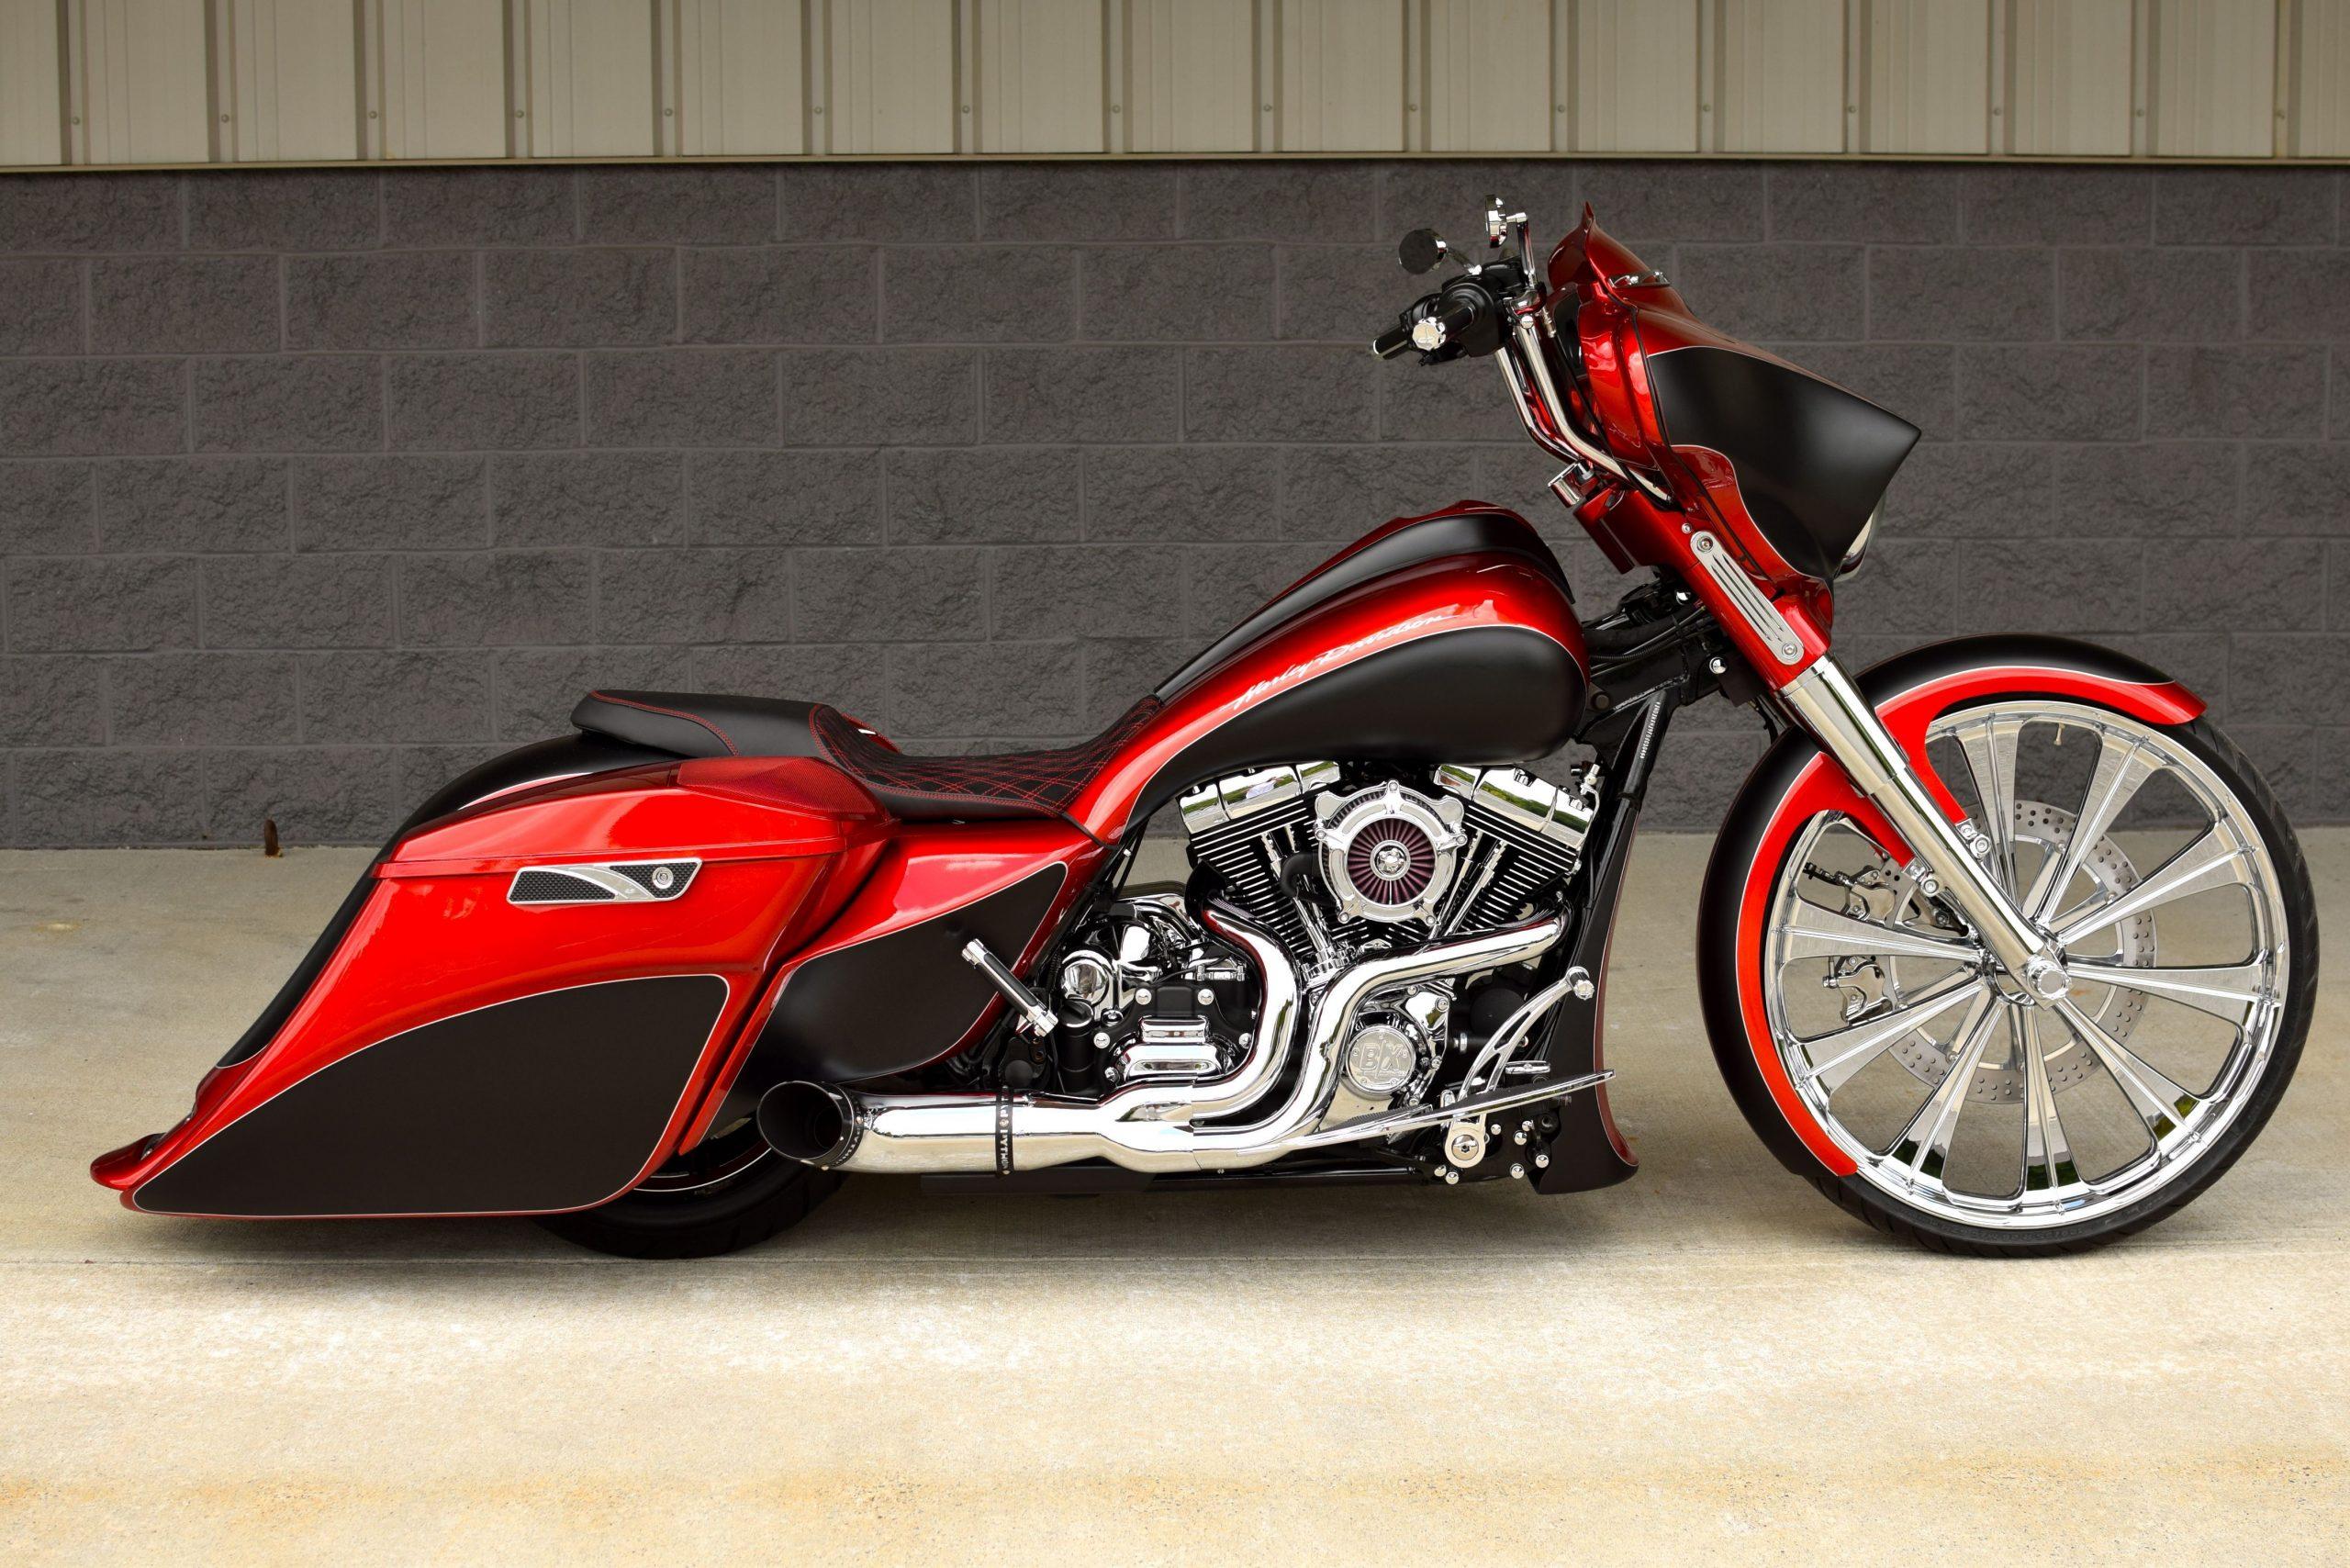 2015 Harley Davidson Street Glide Special – 26″ Wheel – Custom Bagger #23 …